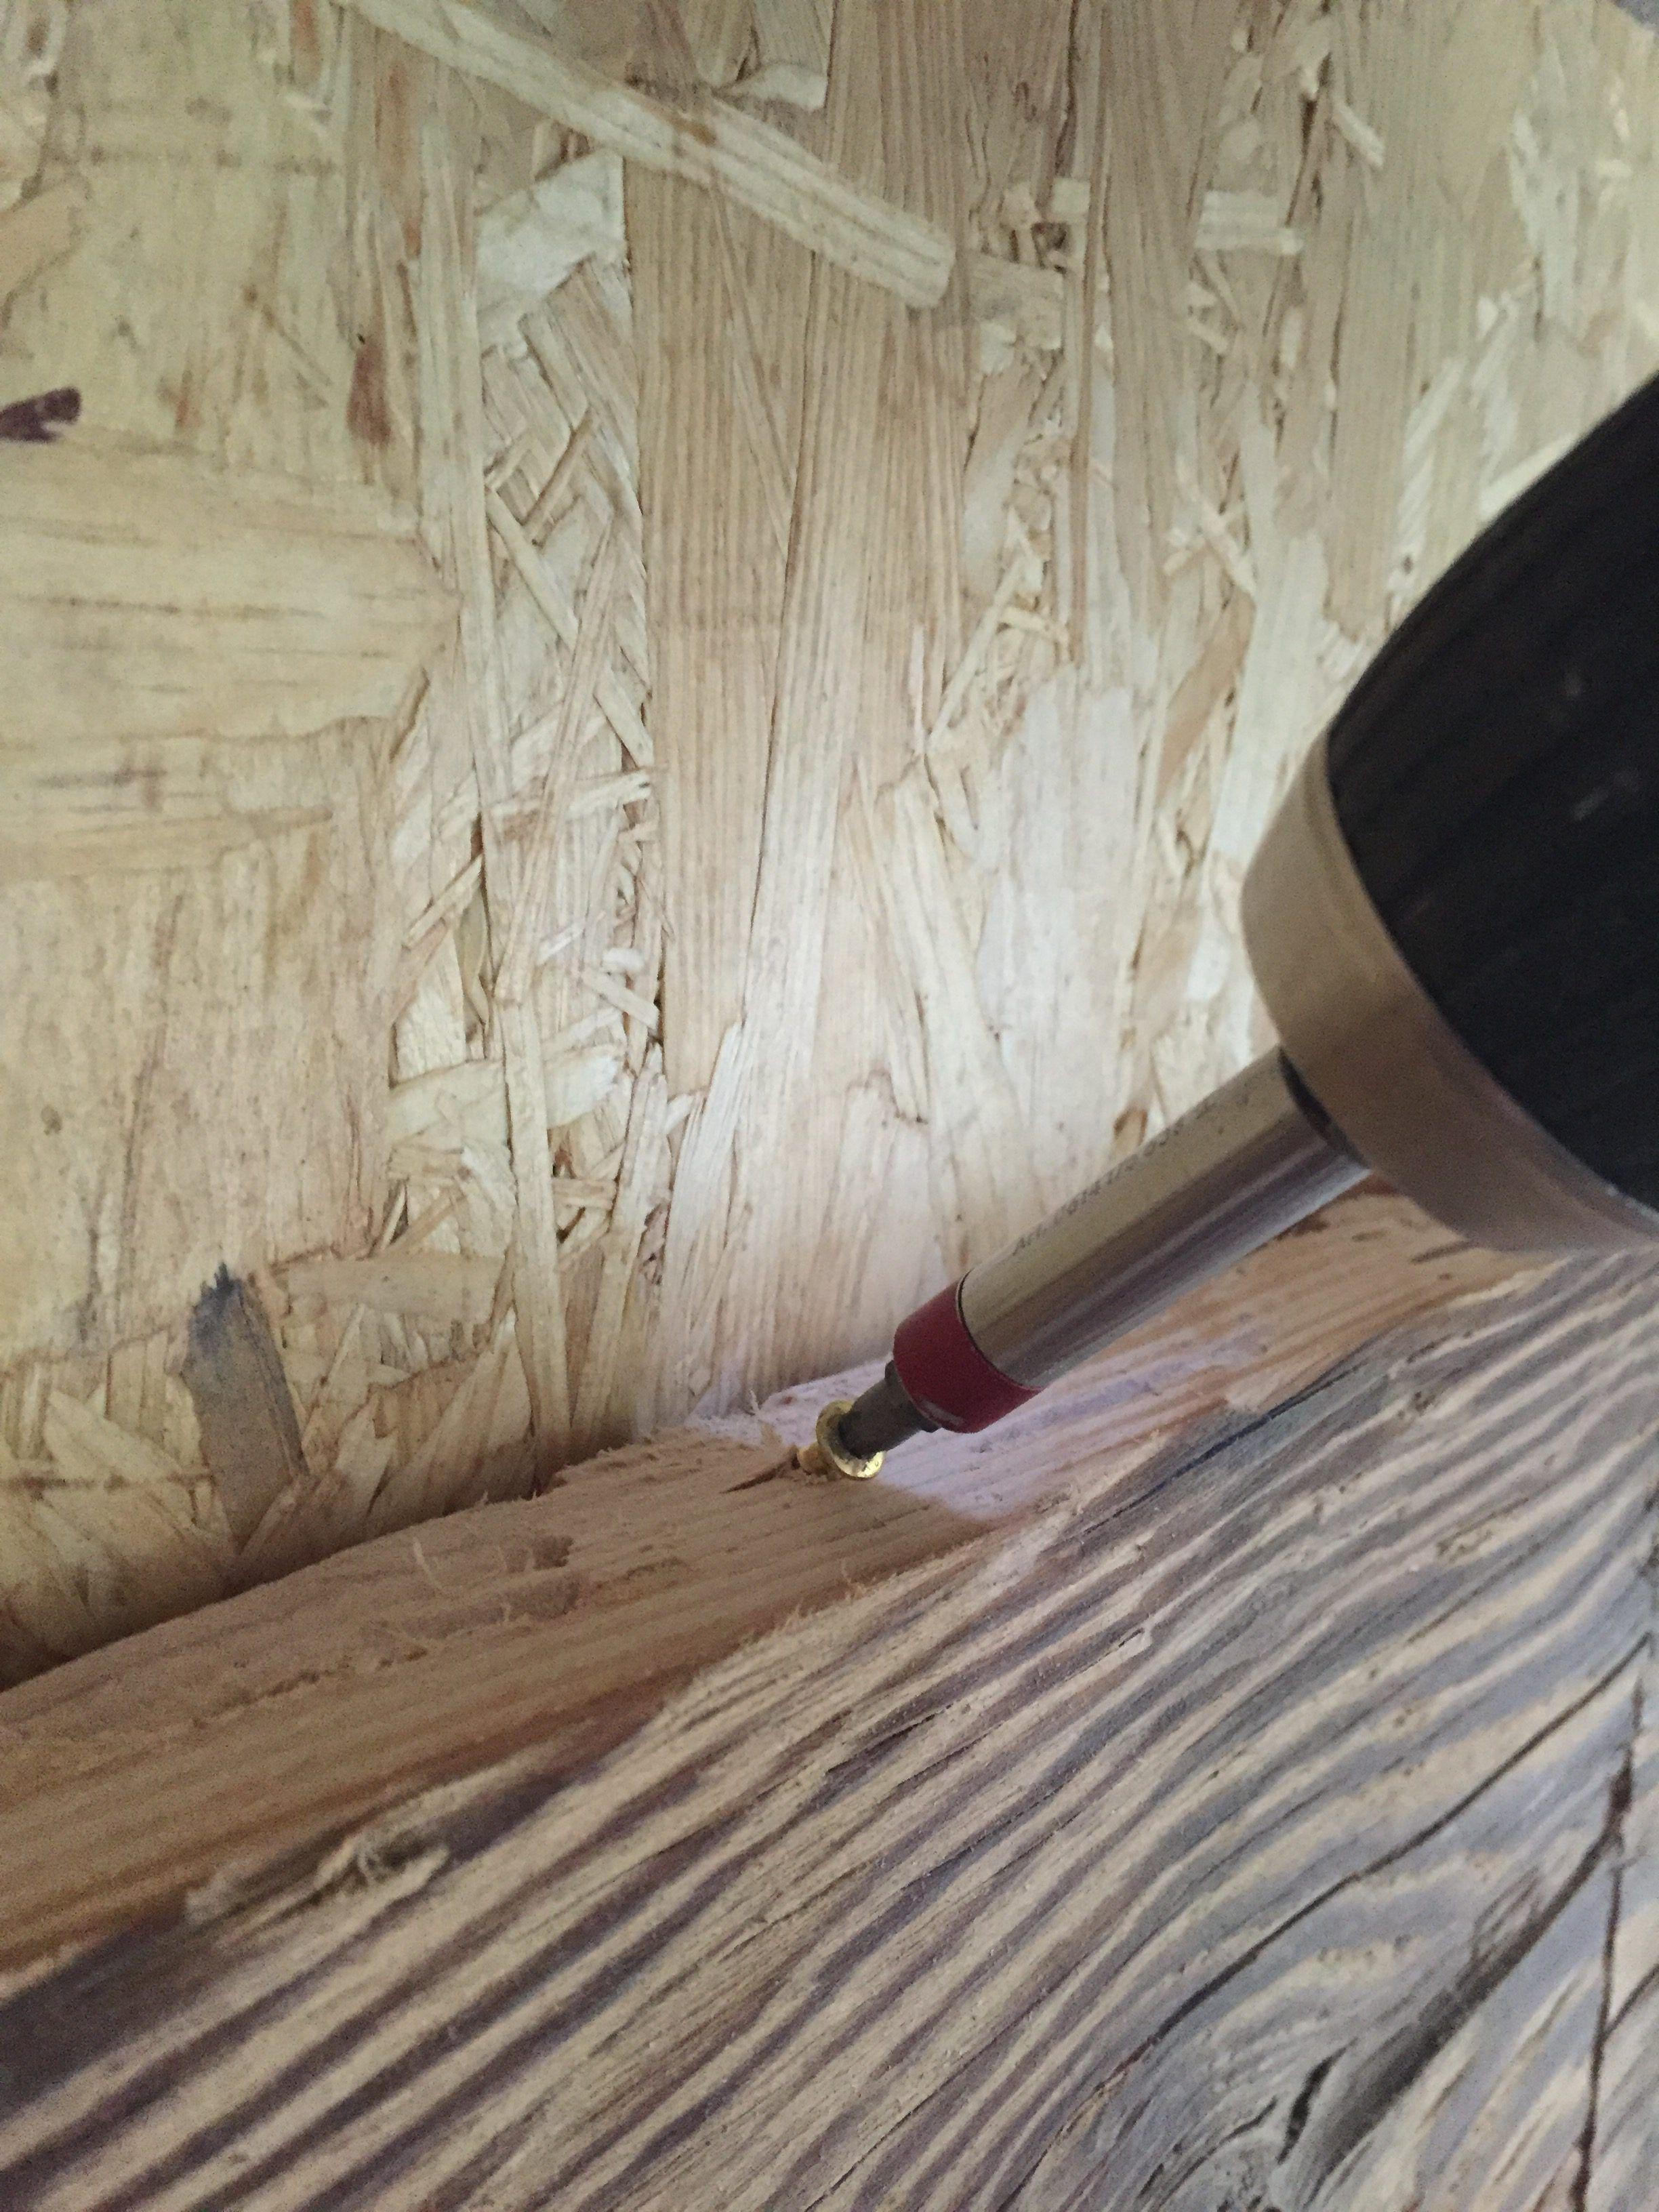 Altholz Bretter Schrag Durch Die Kante Verschrauben Wandverkleidung Altholz Wandverkleidung Wandverkleidung Holz